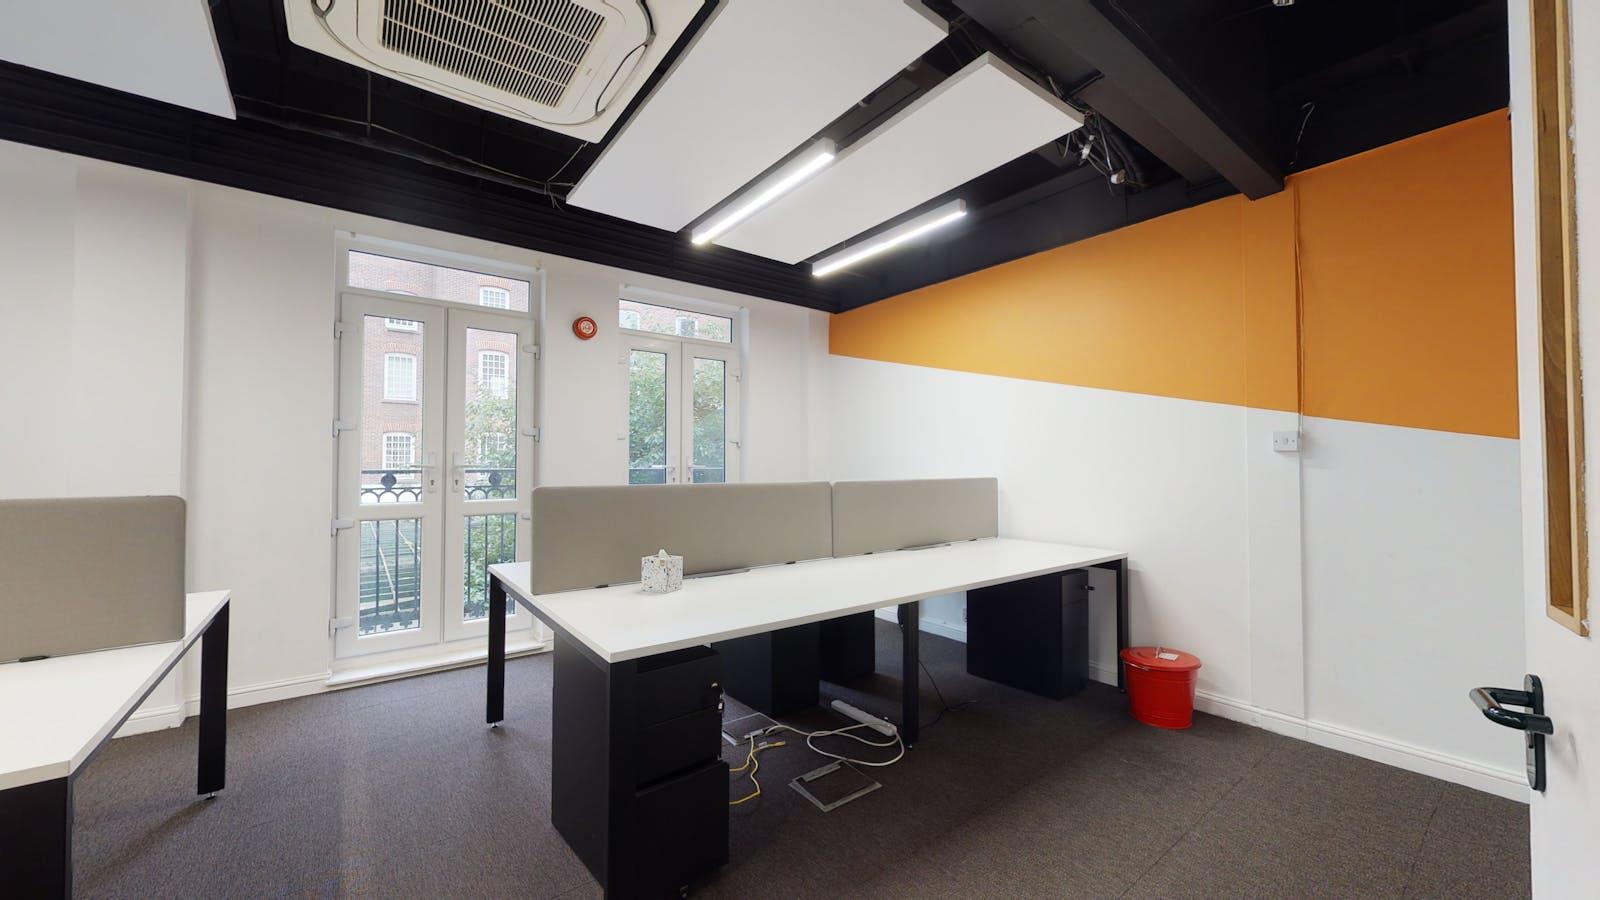 3 Bath Place, 3 Bath Place, London, Office To Let - Space Photo 6.jpg